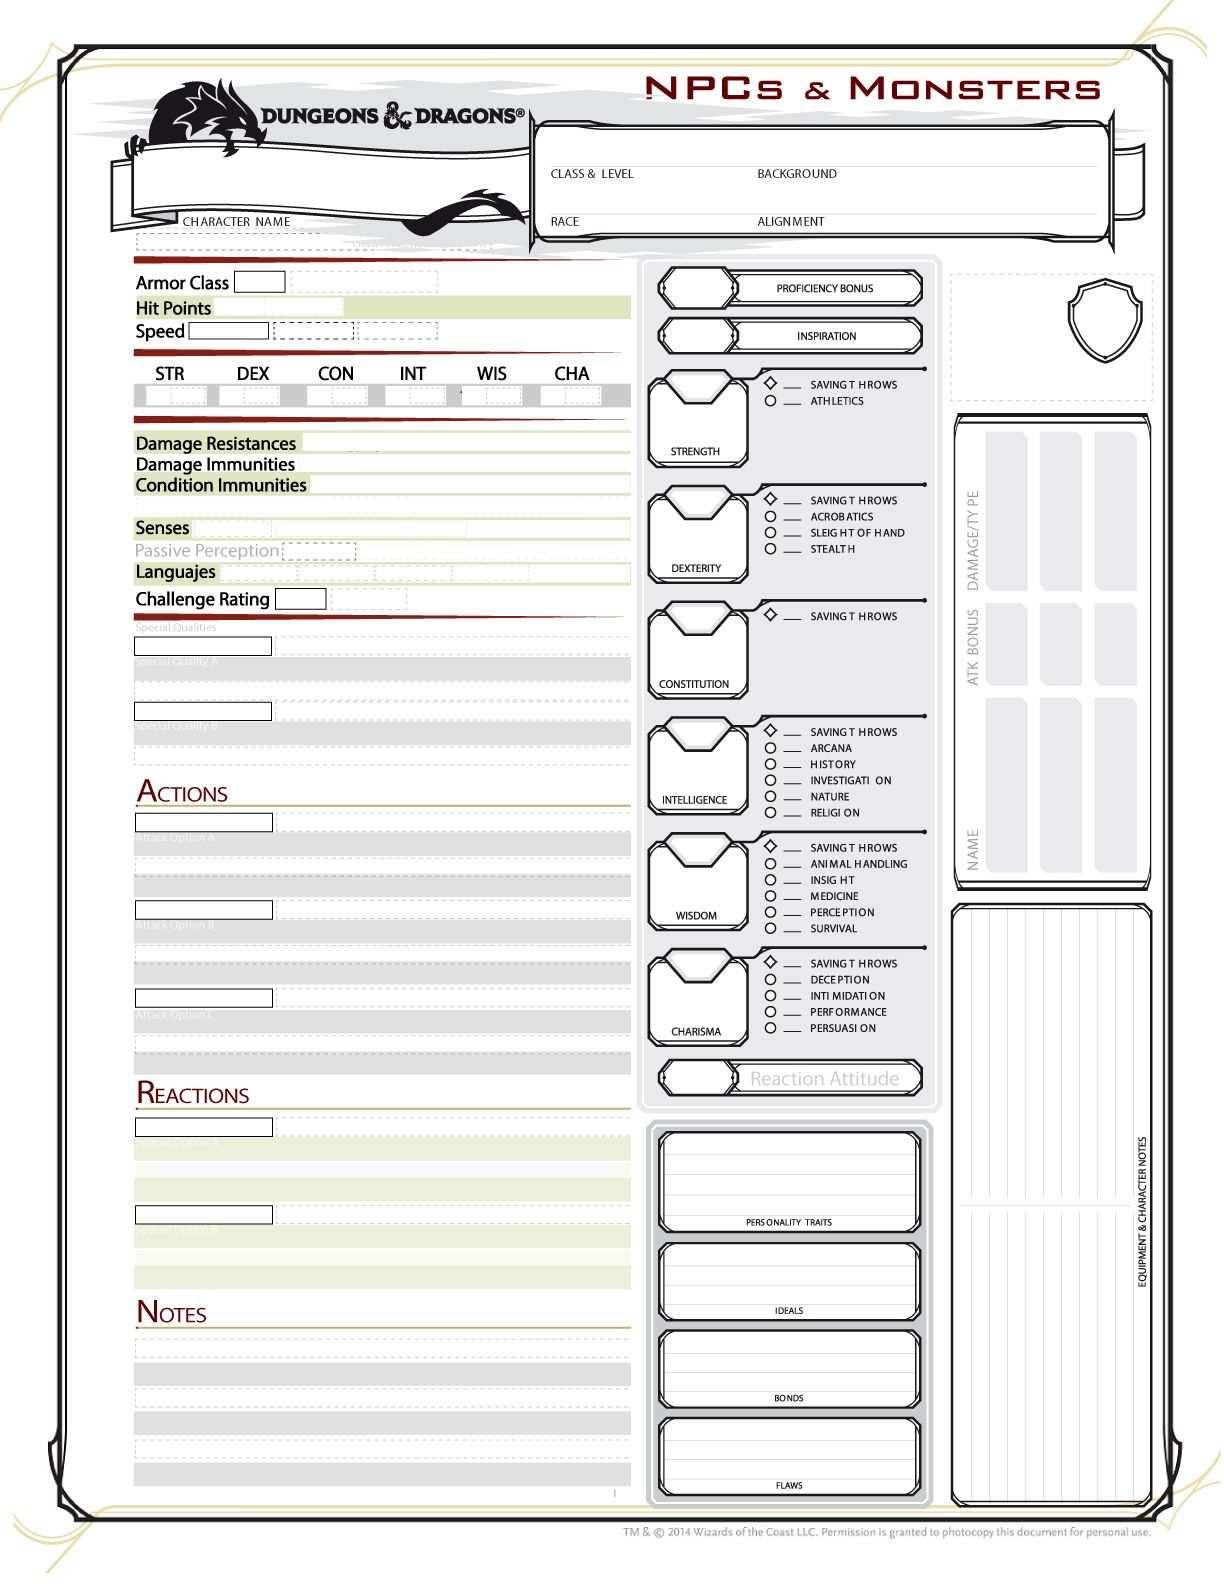 Http Community Wizards Com Sites Mtgcommunity Files D 26d Next Monster 26npc Sheet Fan Made Jpg Dungeons And Dragons Dnd Character Sheet Character Sheet